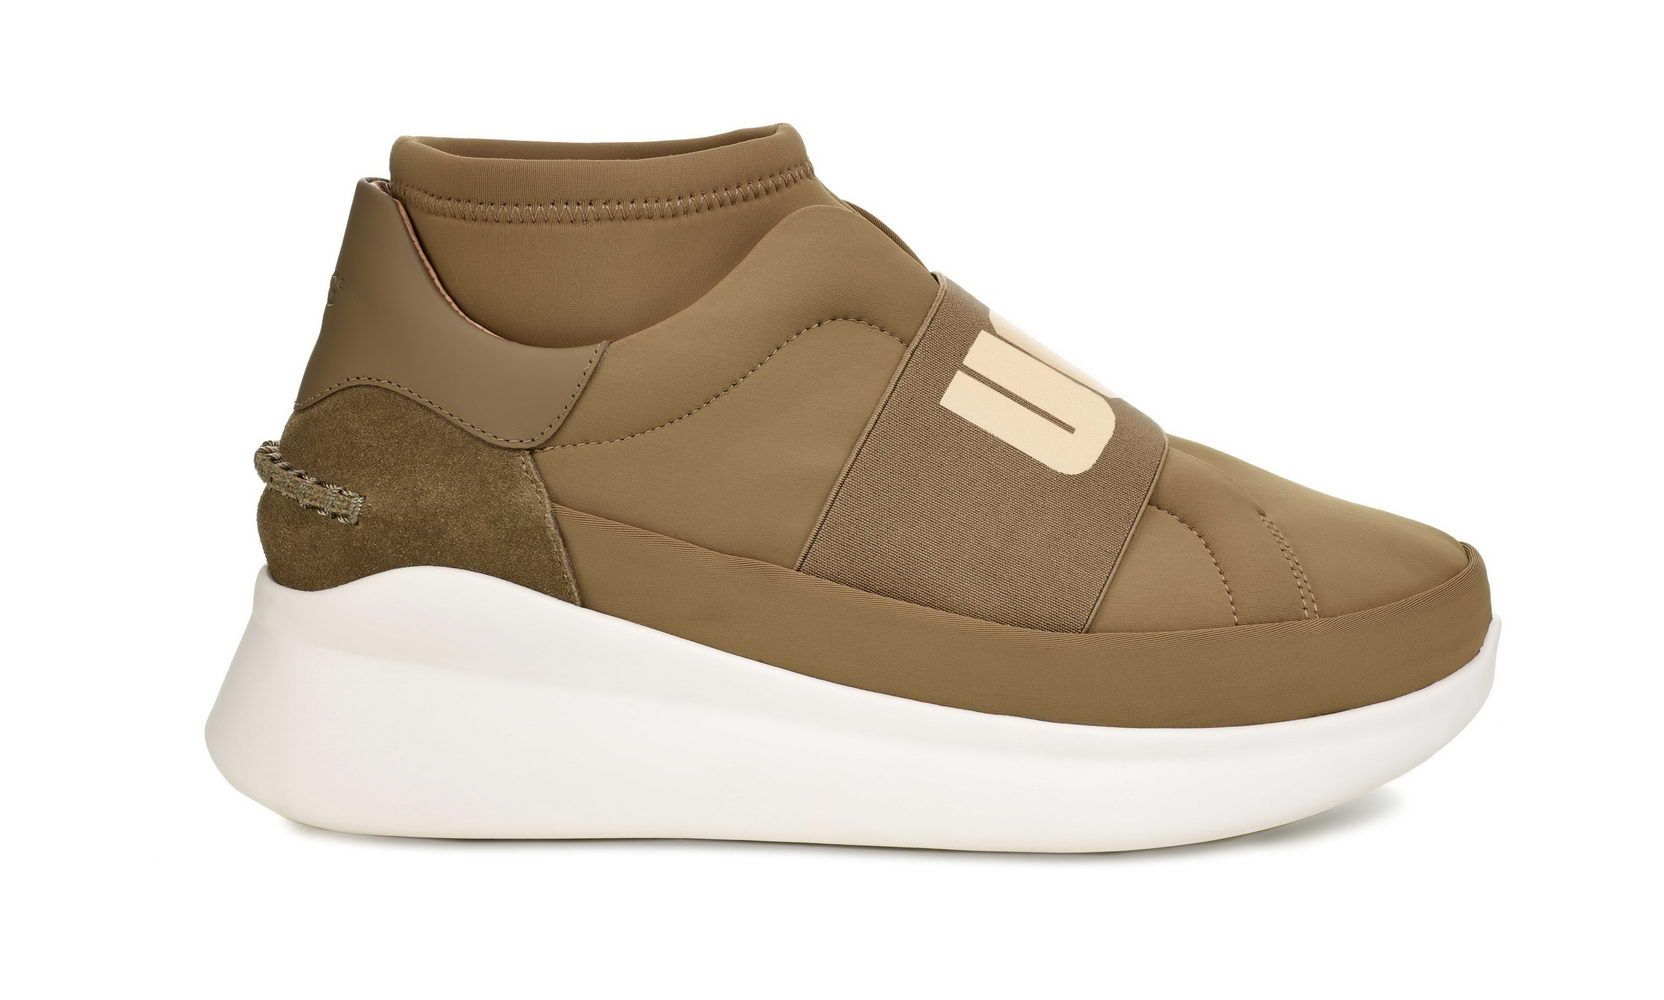 W_Neutra_Sneaker_(1095097-ALP)_(1).PVP.139.00__resize